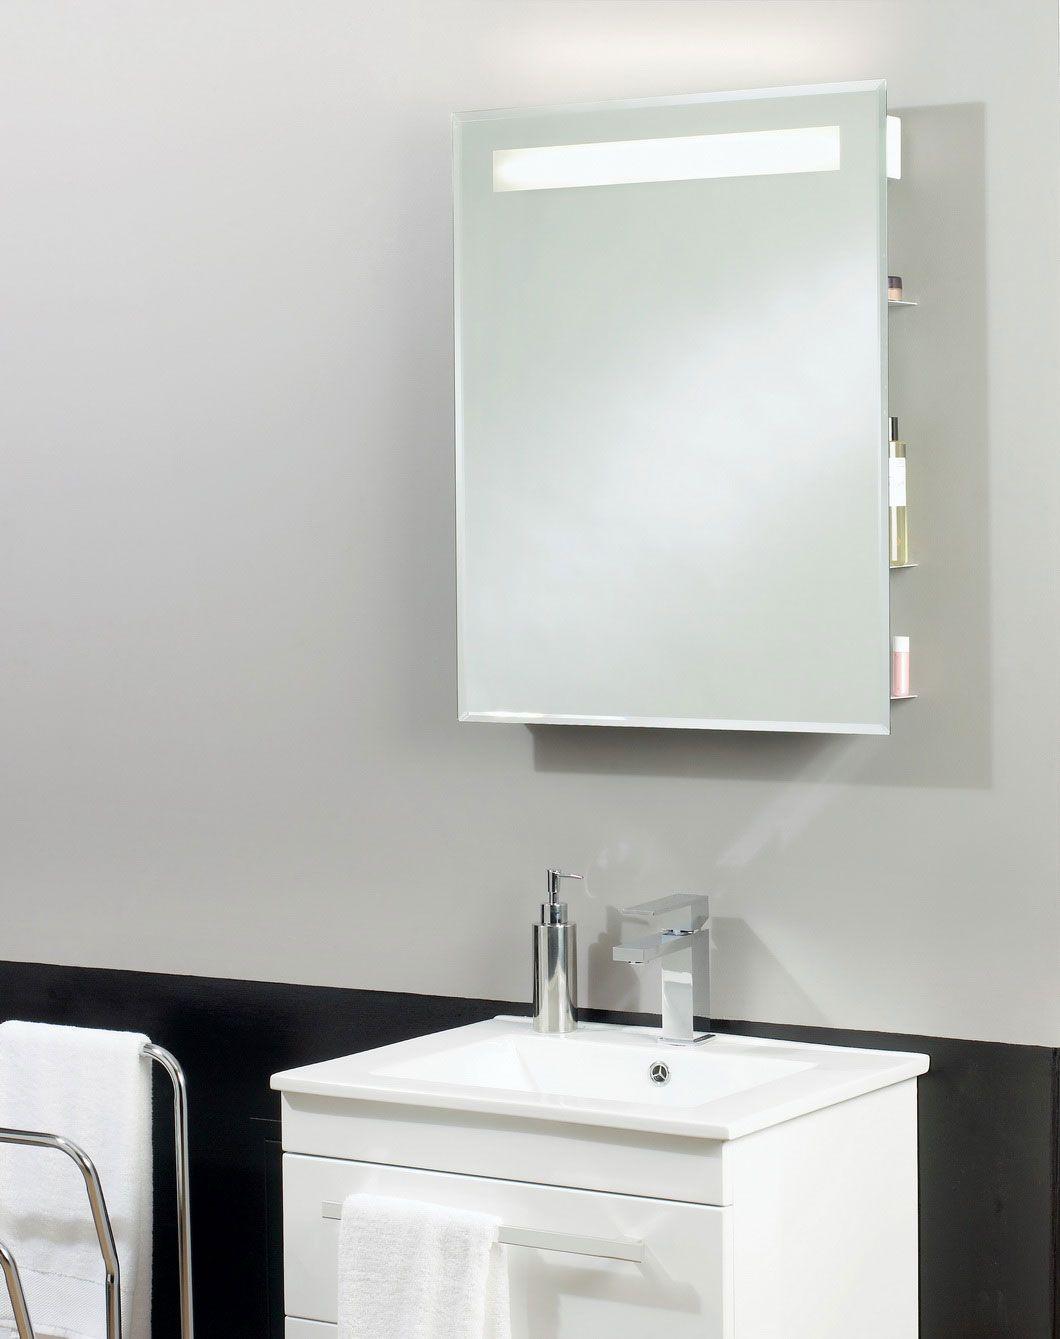 Bathroom Mirror Designs 25 Best Bathroom Mirror Ideas For A Small Bathroom  Bathroom